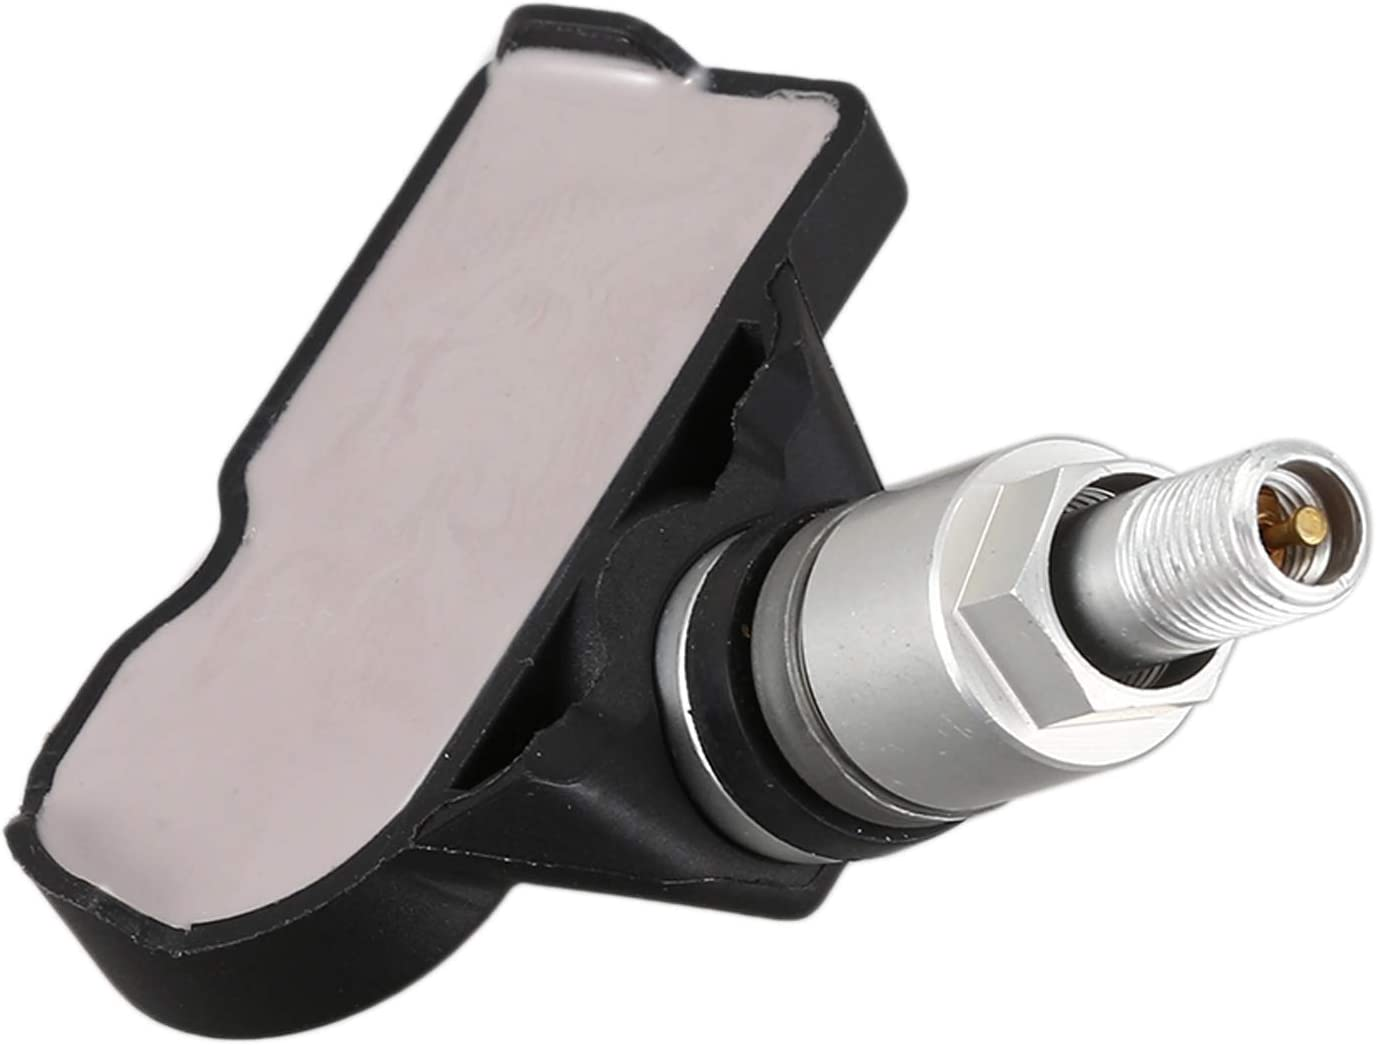 RETYLY 4X Nuevo Sensor TPMS RDCi RDKS Reifendrucksensor para V W Passat 3AA907275B